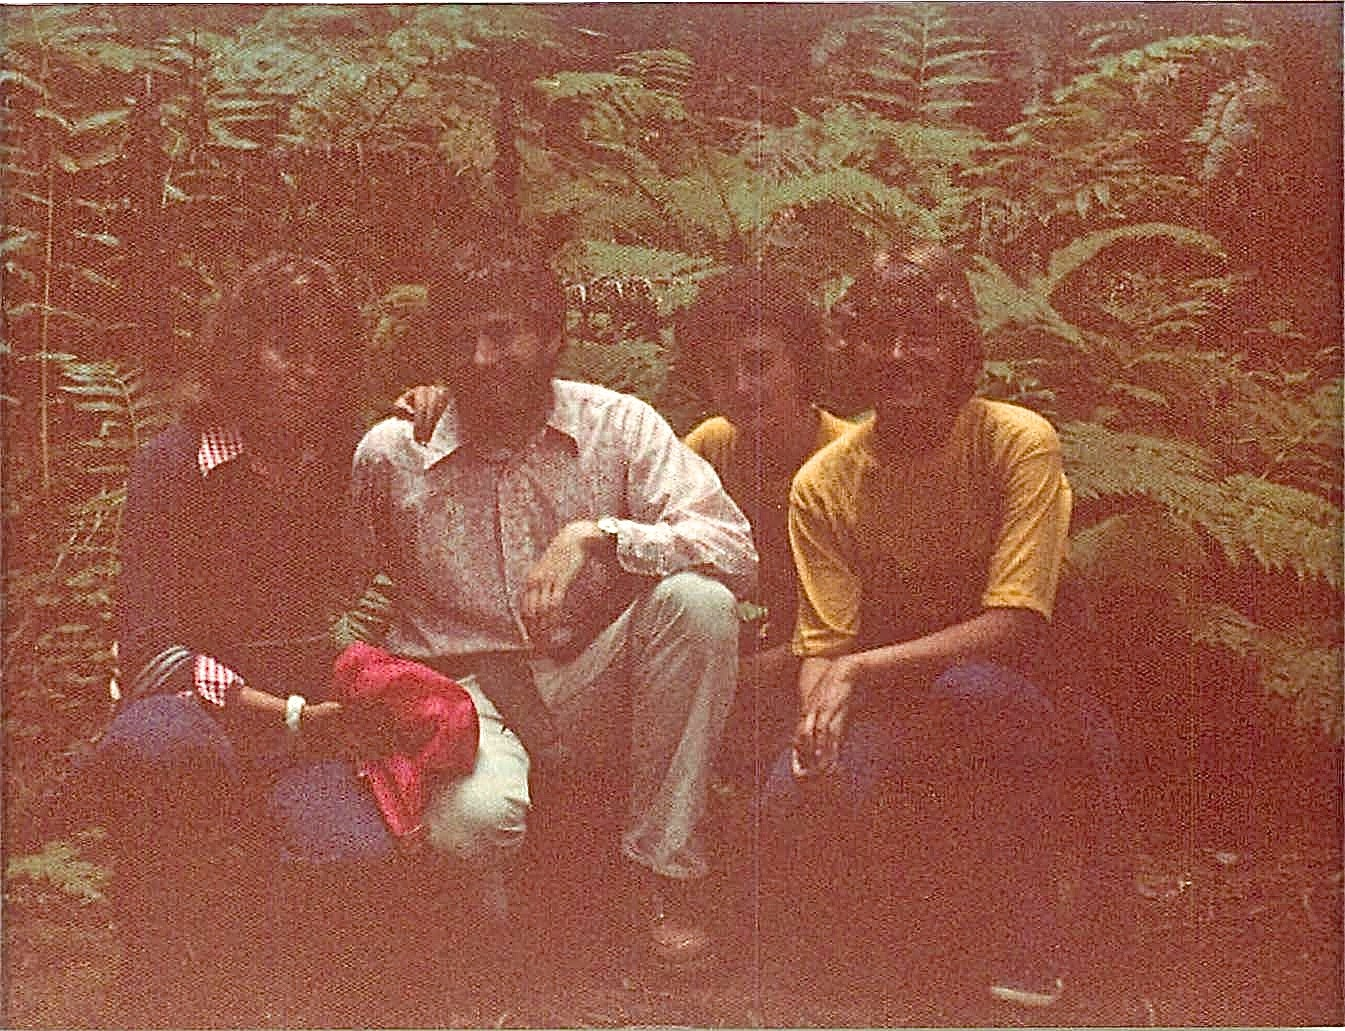 1975 Muir Woods, Celeste Gudas, Joh, Ann, & Cindy Wagner